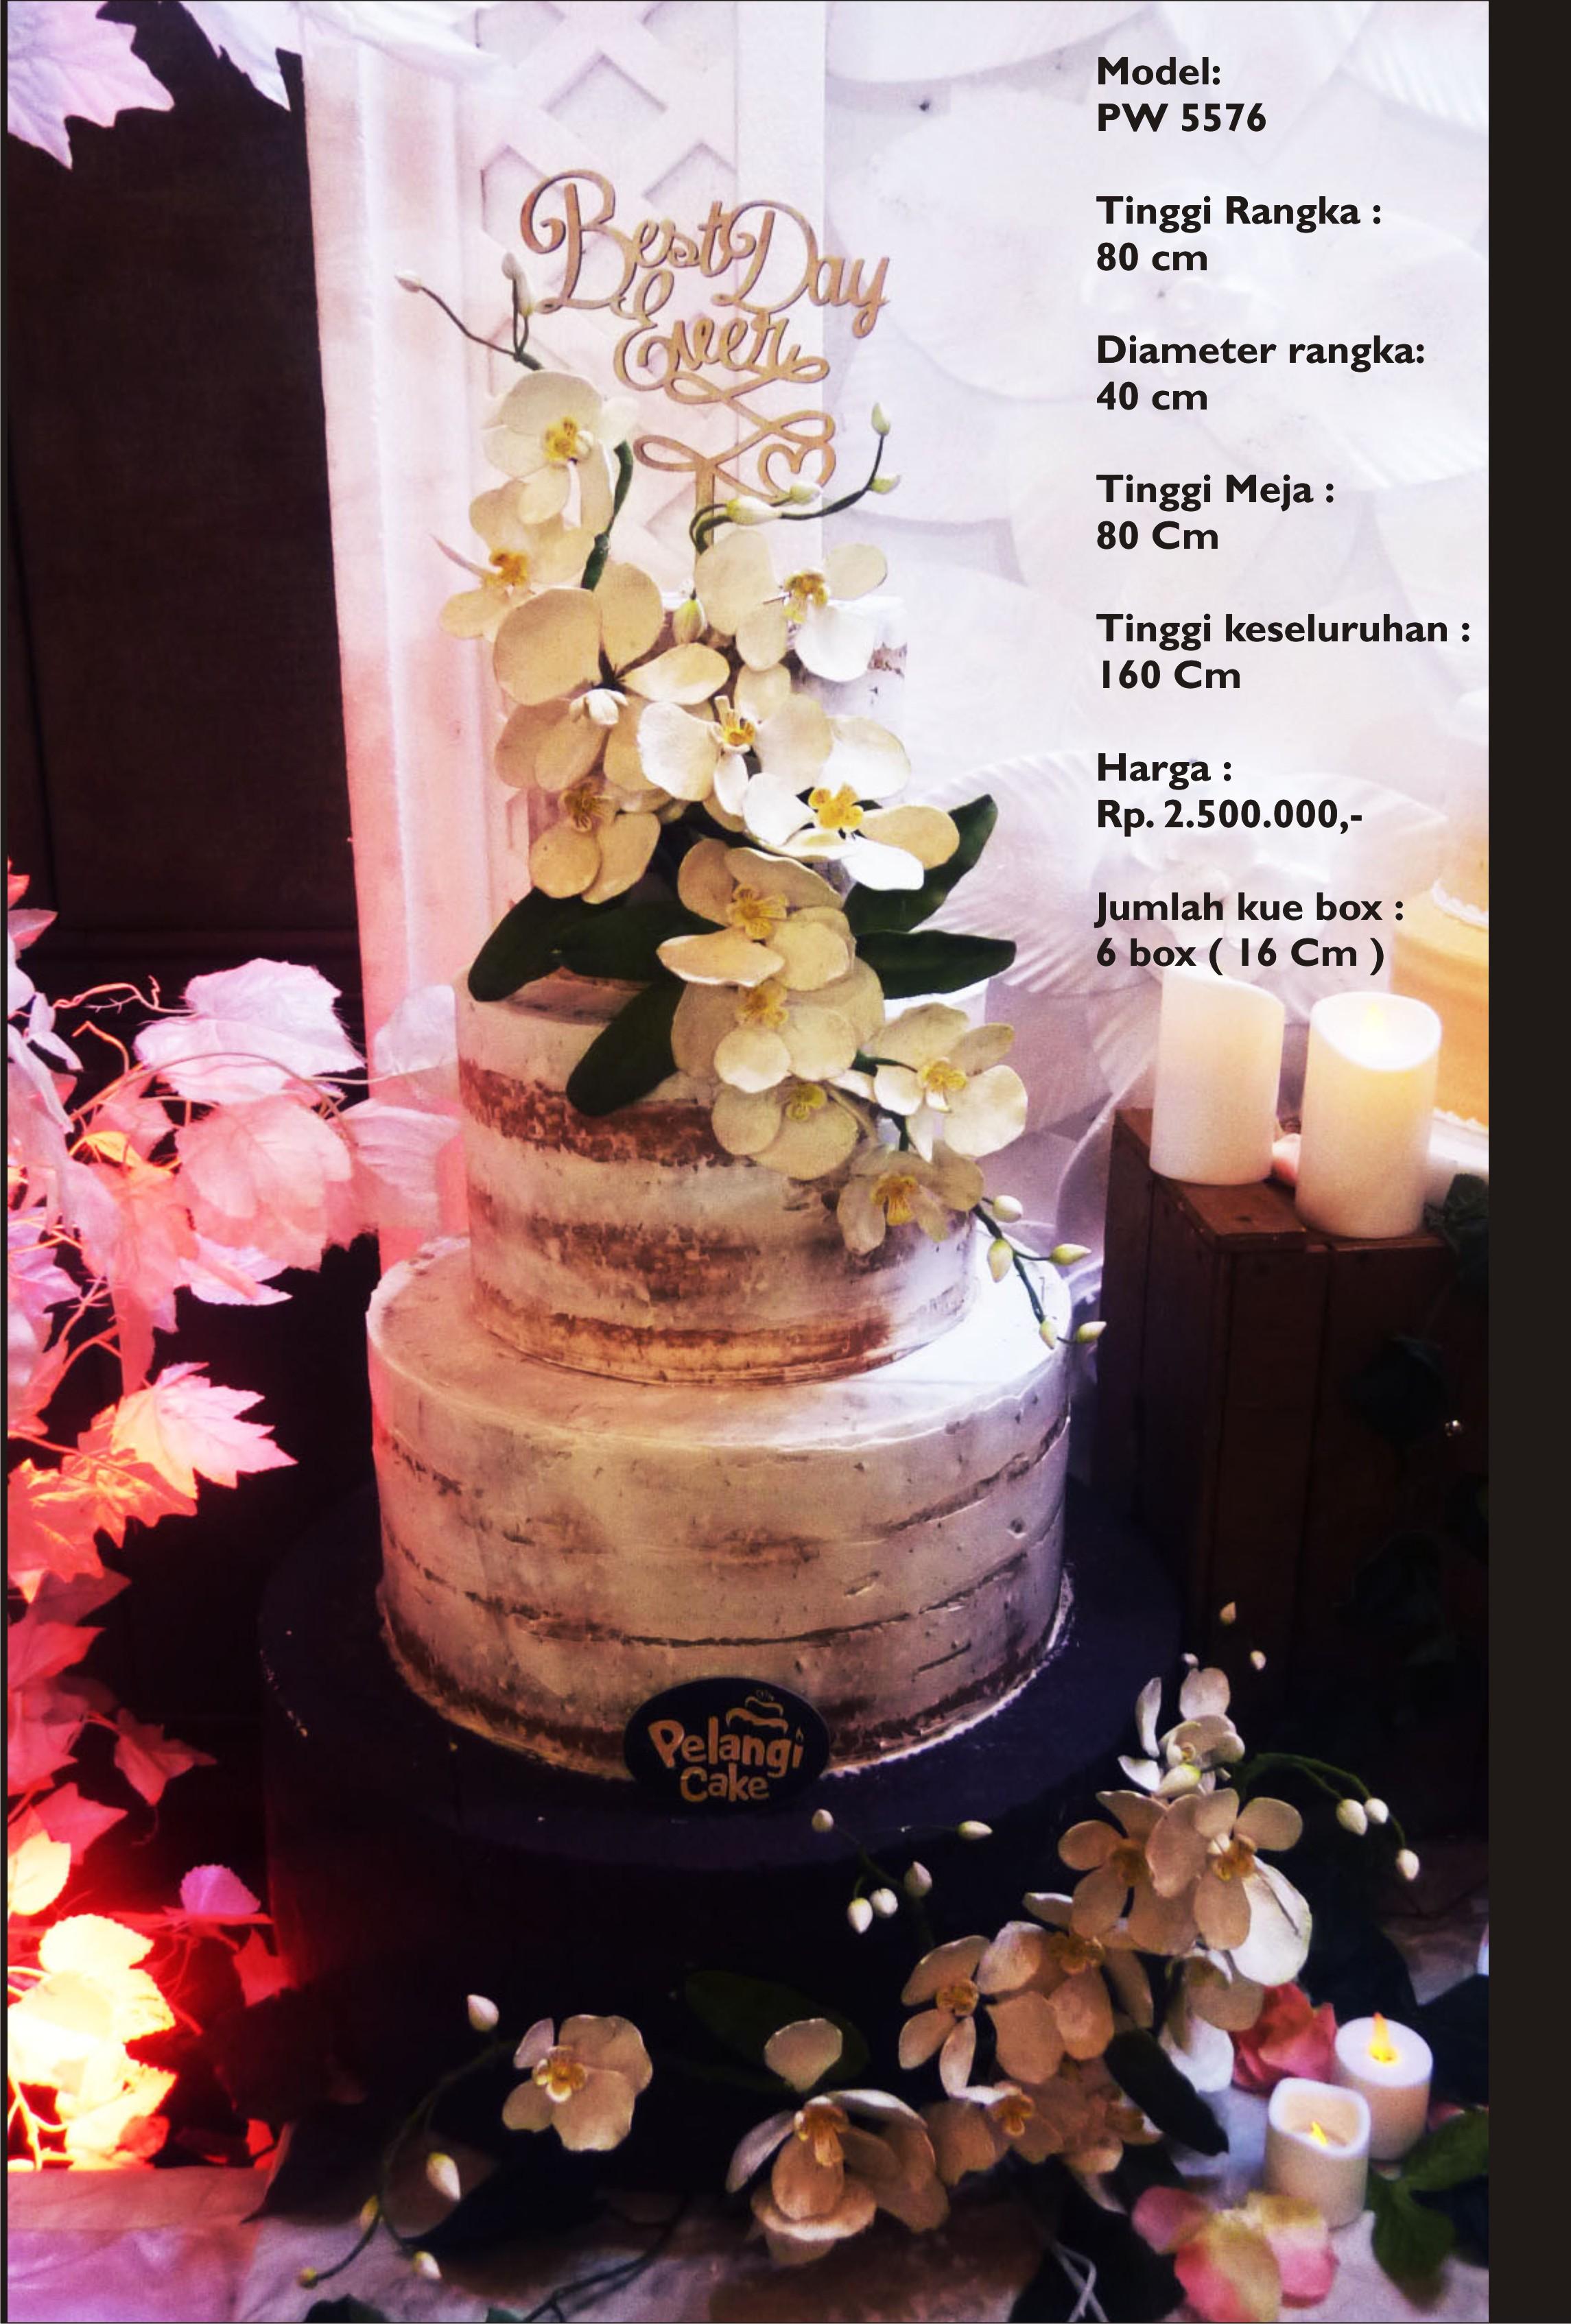 Wedding Cake 3 Tiers By Pelangi Cake Bridestorycom - Harga Dummy Wedding Cake